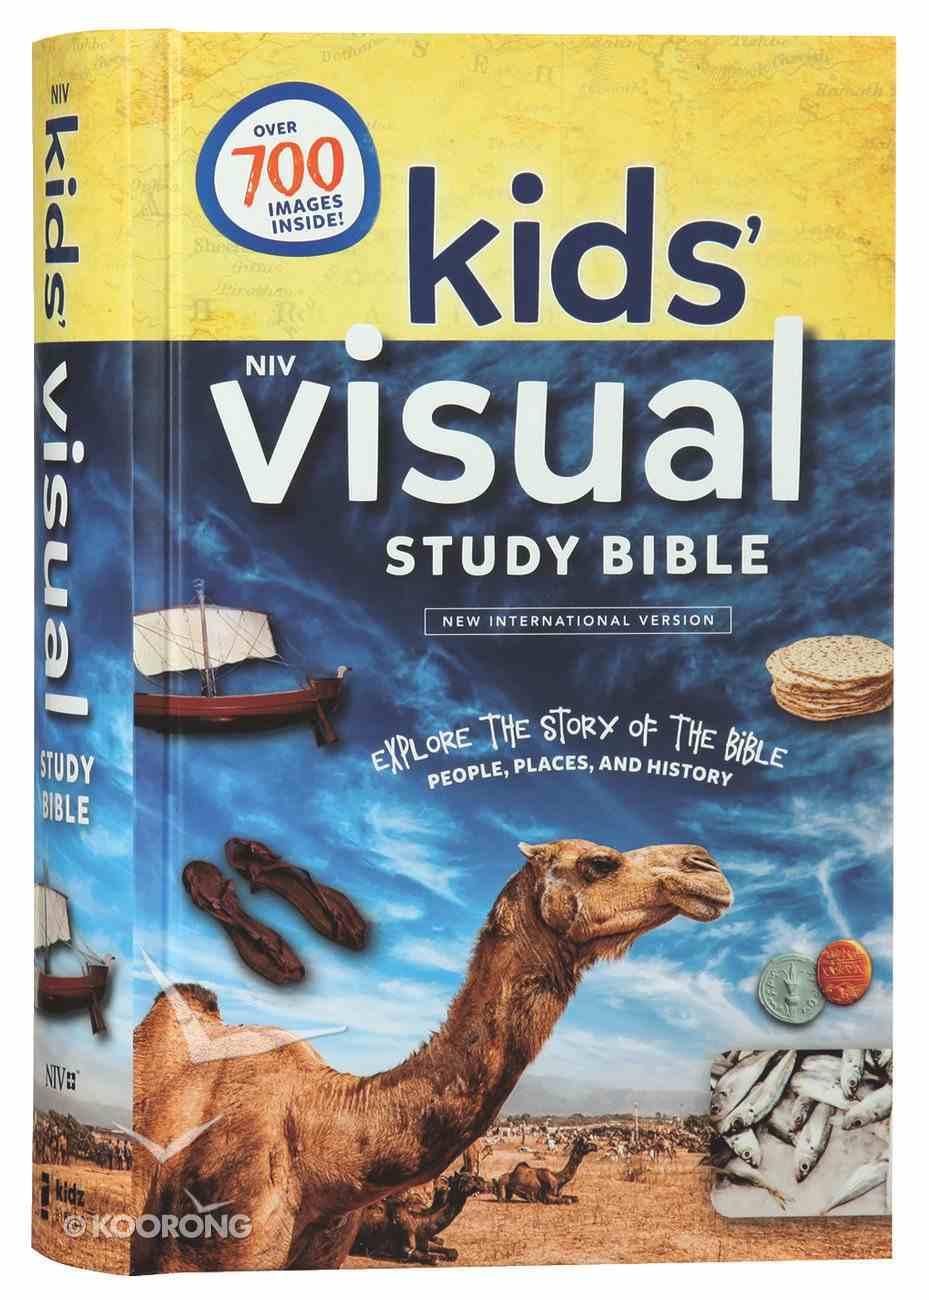 NIV Kids' Visual Study Bible Full Color Interior Hardback